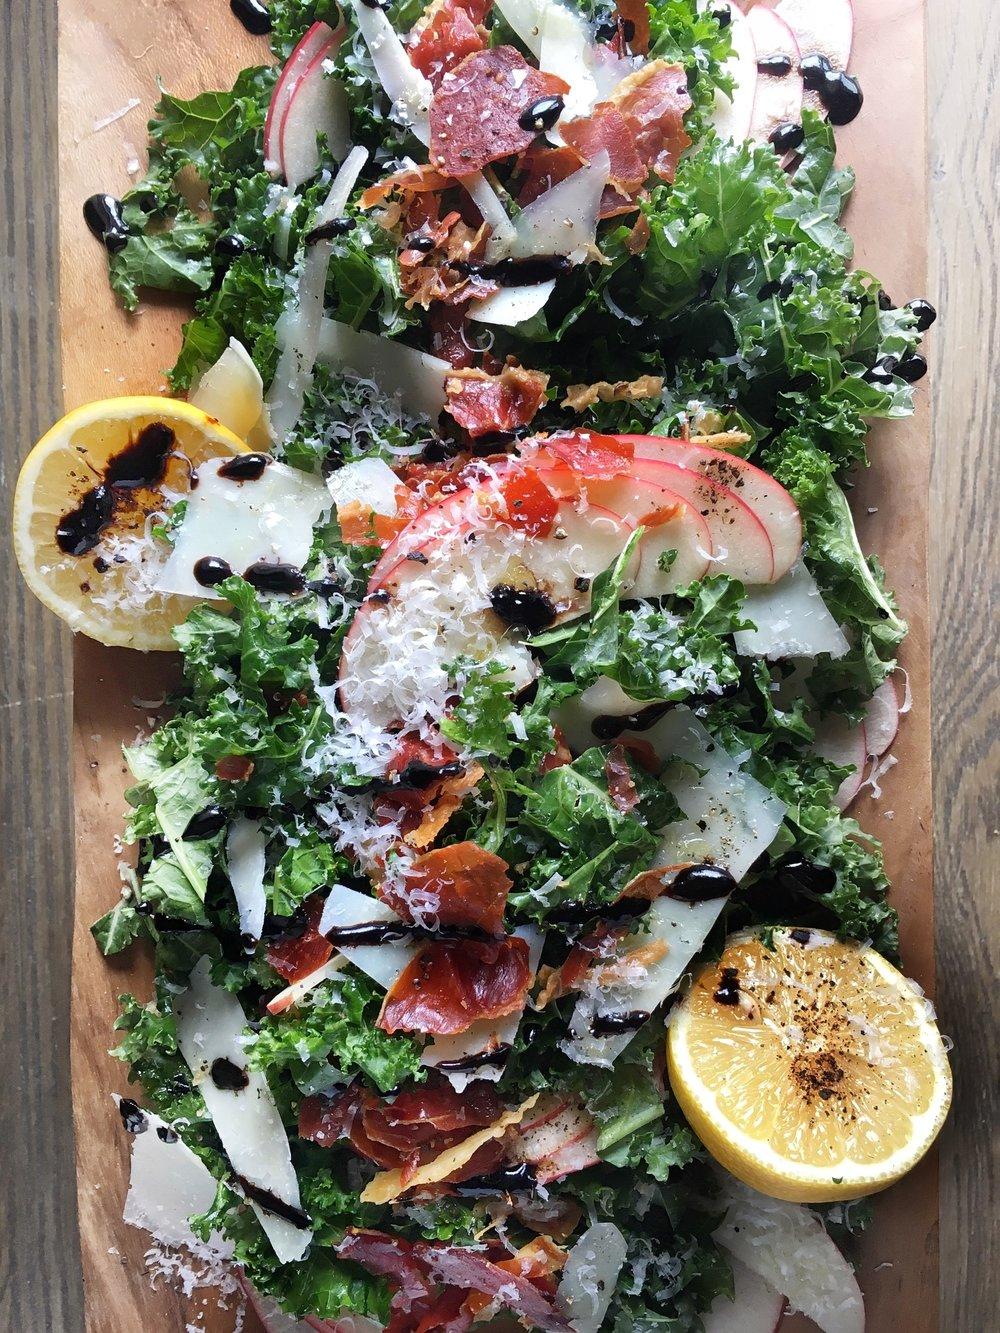 Kale, Apple, and Pecorino Salad with Crispy Prosciutto and Balsamic Crema by Judy Kim